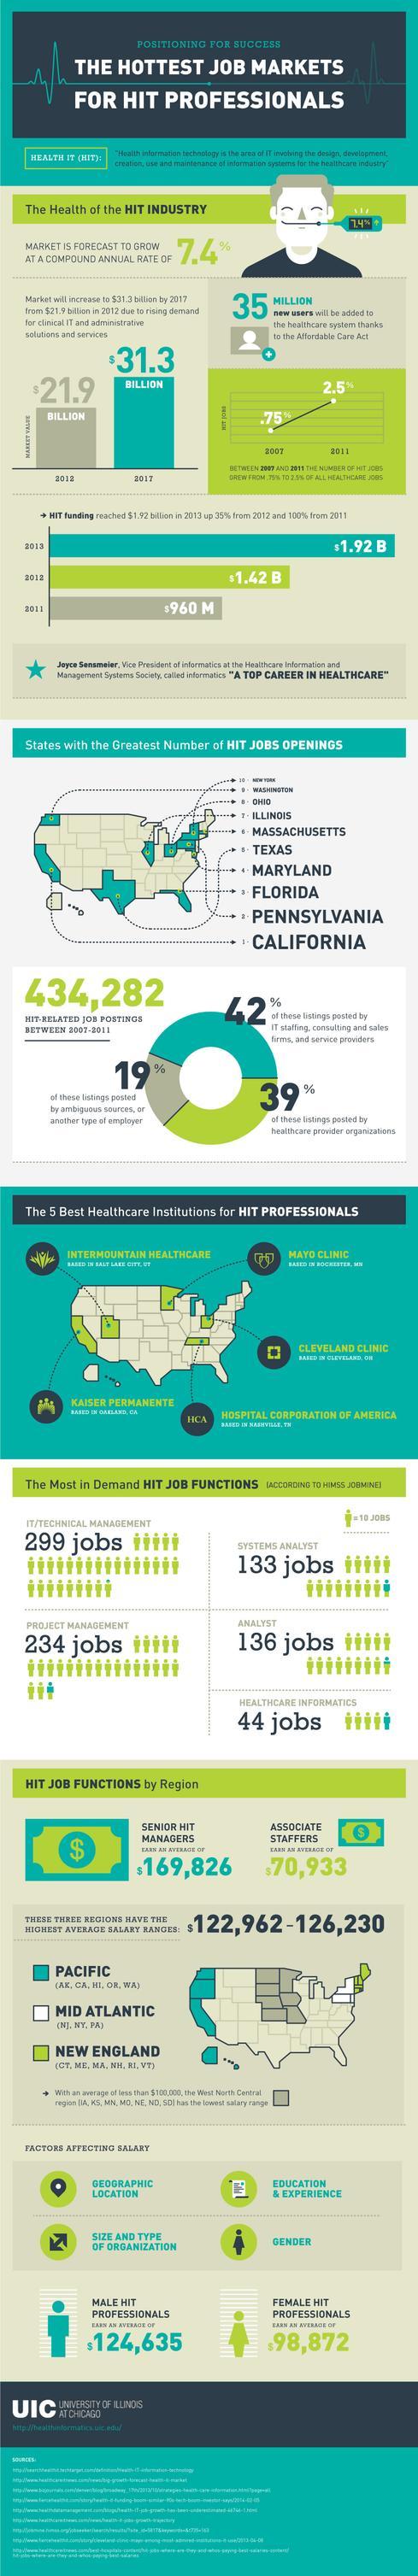 (Source: UIC Health Informatics Online, University of Illinois, Chicago)